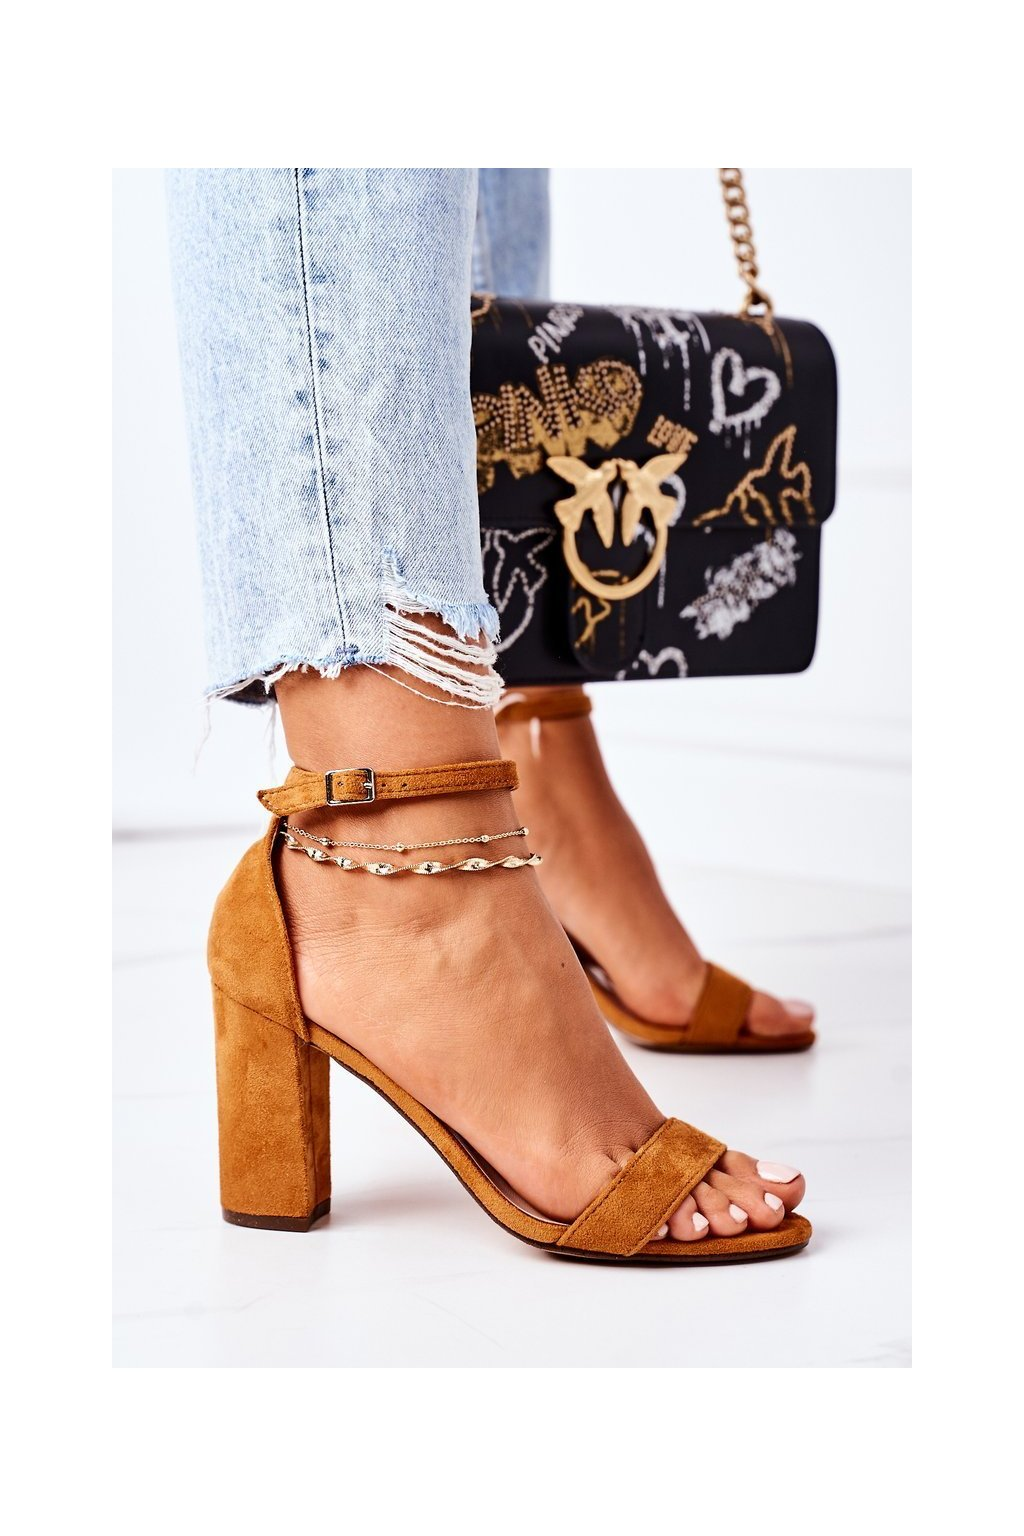 Dámske sandále farba hnedá NJSK CD59 CAMEL